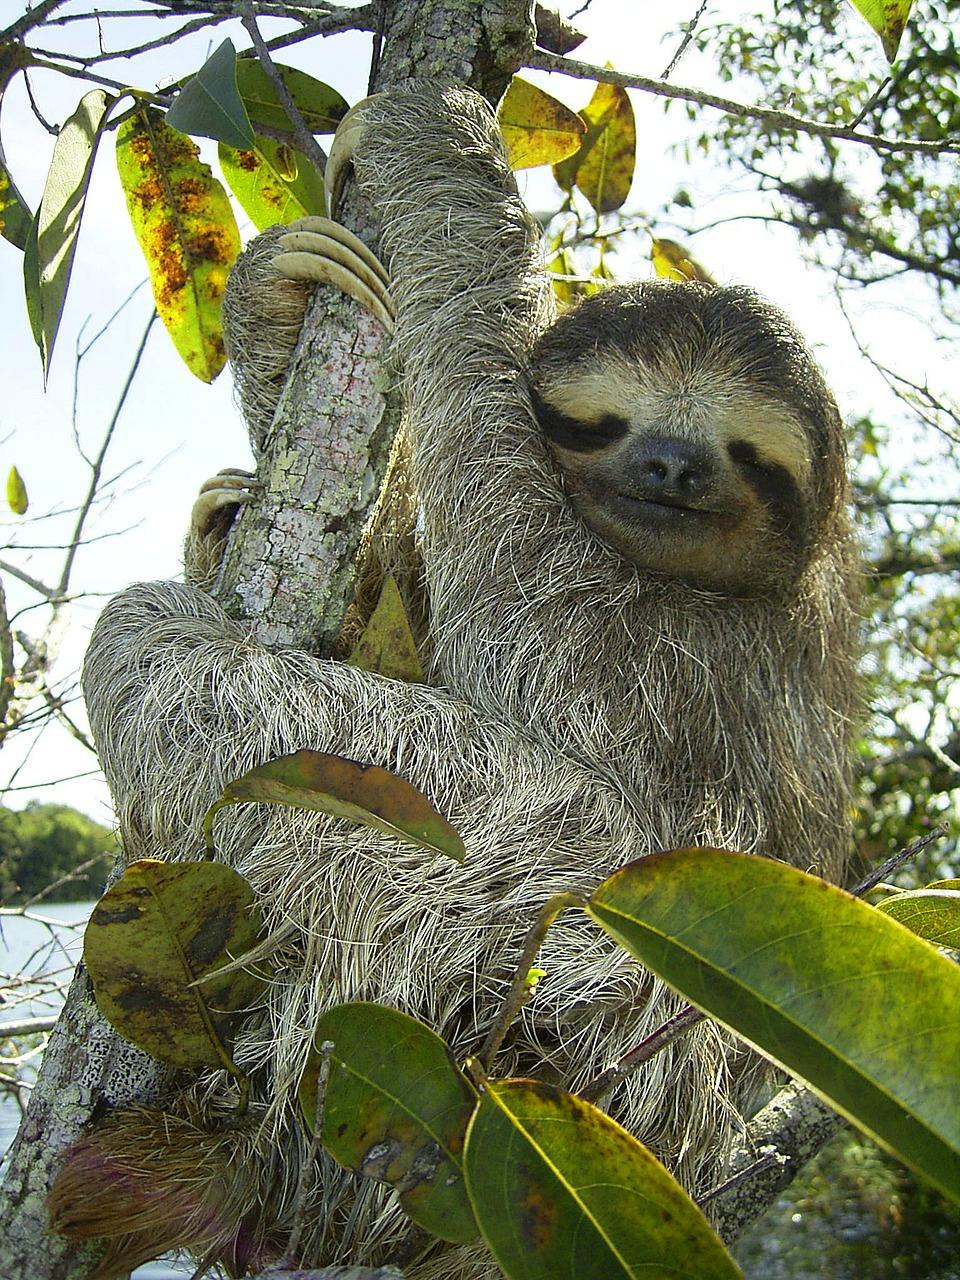 pygmy-sloth-62869_1280